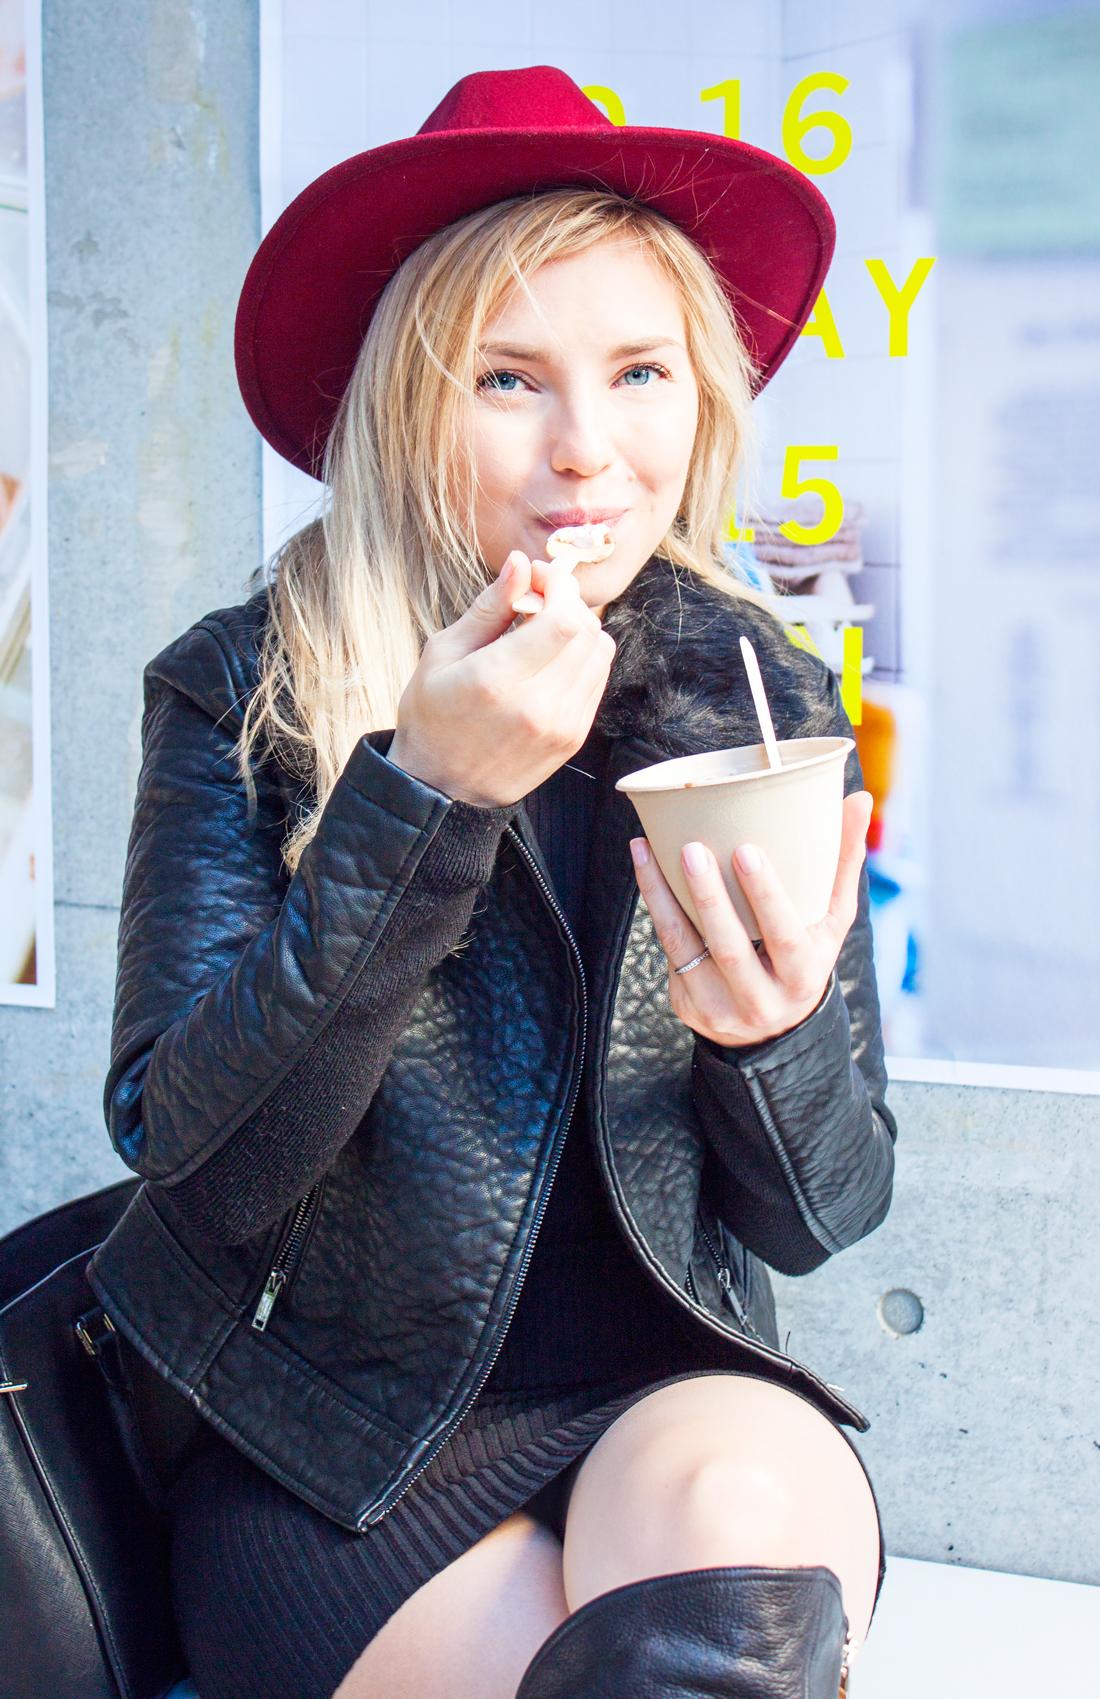 kippy's coco-cream ice cream, coconut ice cream, vegan ice cream, tokyo coconut ice cream, david otto, david otto juice, raw pressed juices tokyo, david otto tokyo, kit-sando,kippy's coco-cream ice cream tokyo